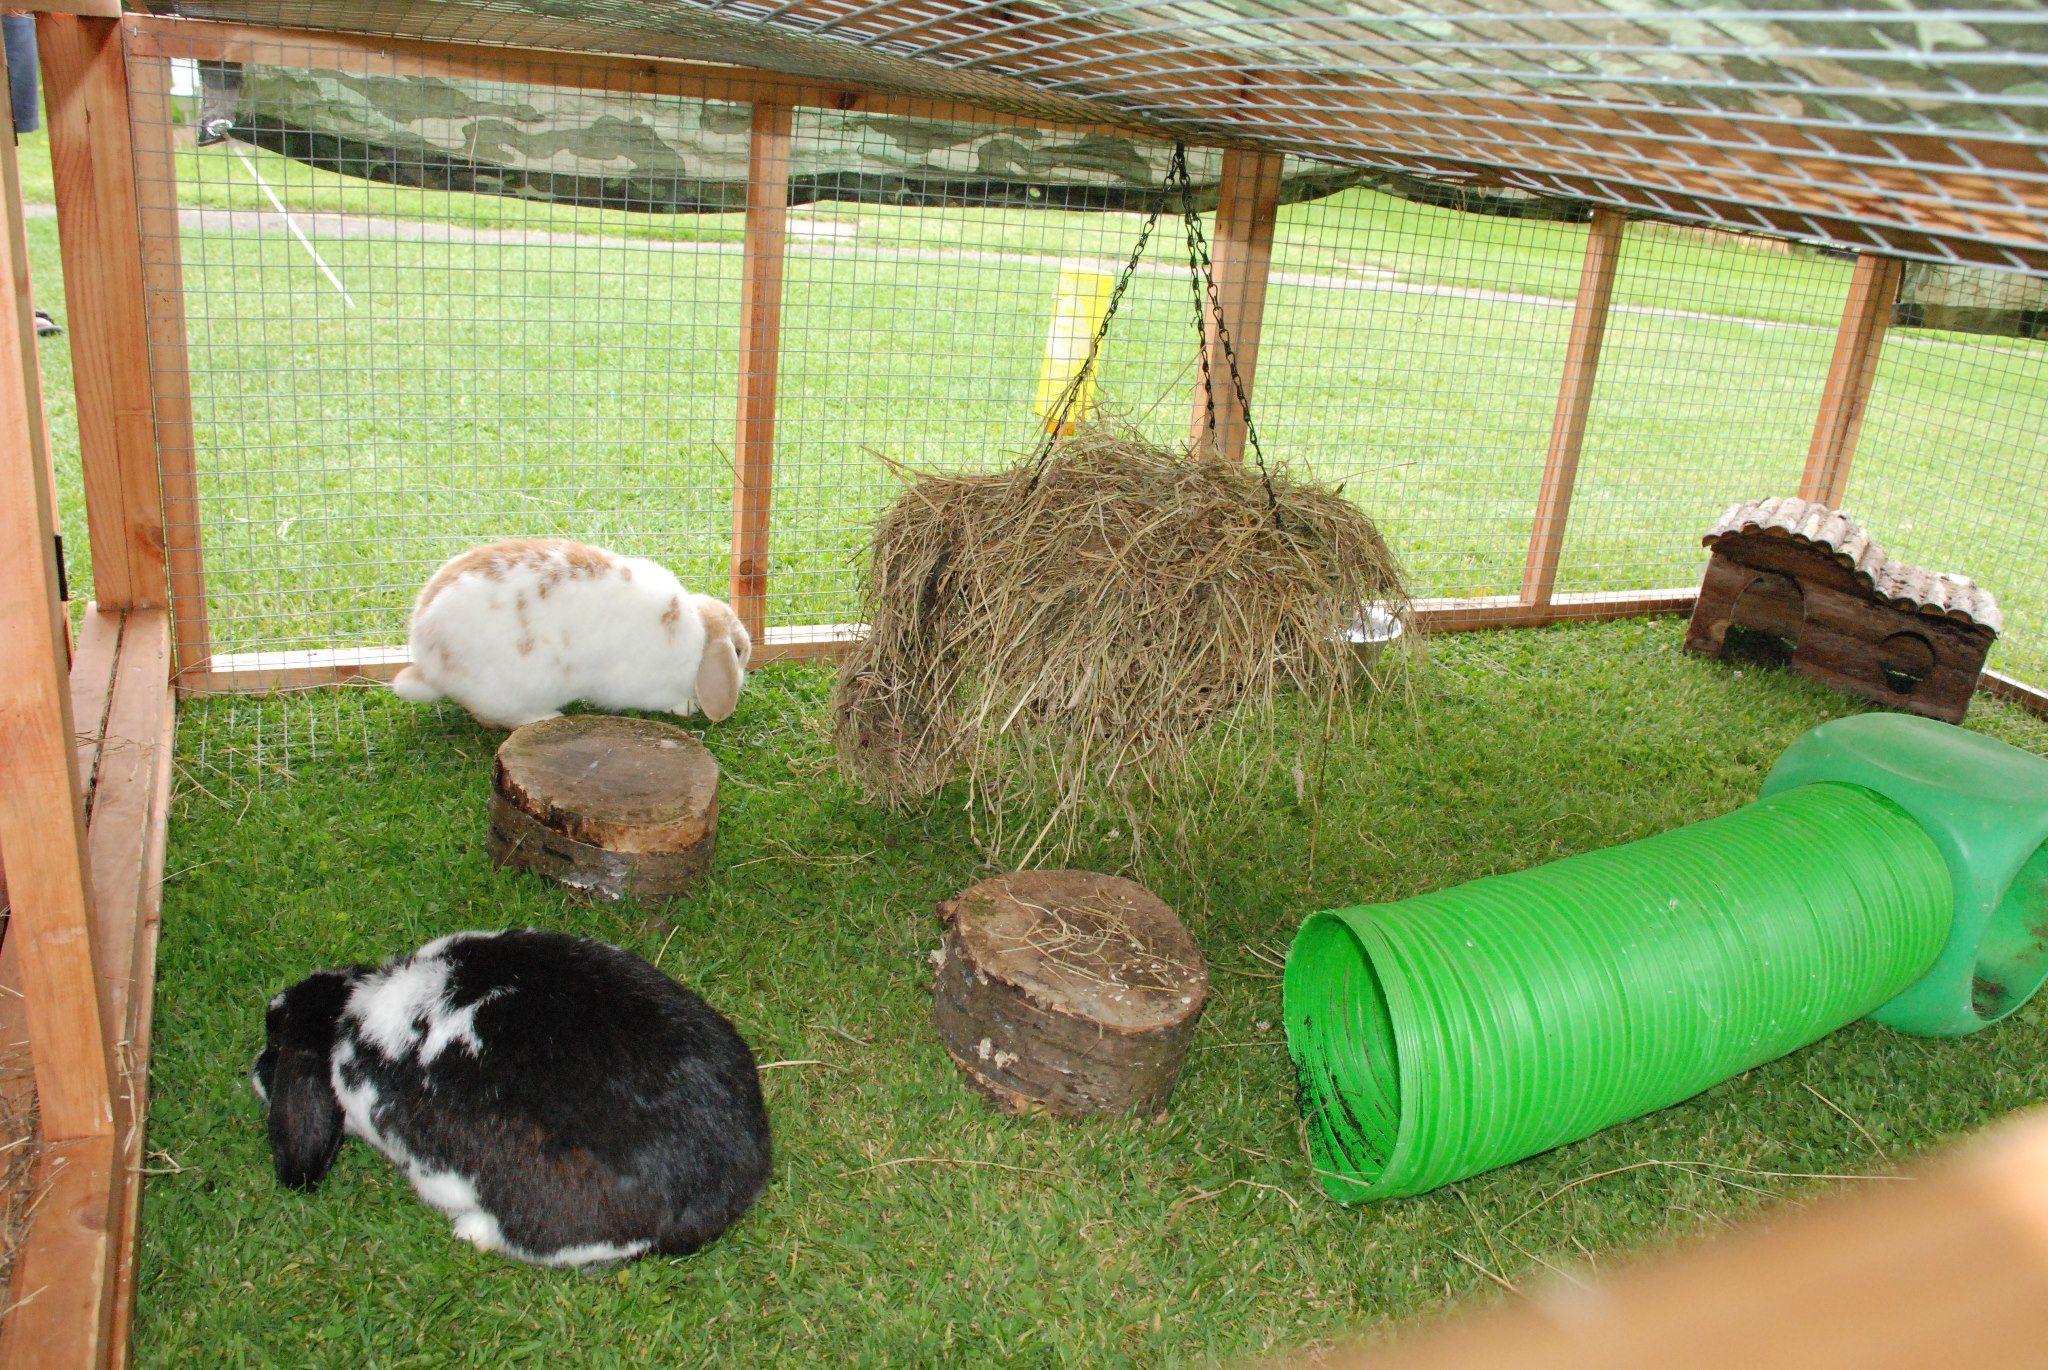 Spacious rabbit run outdoors need to make pinterest for Outdoor rabbit enclosure ideas